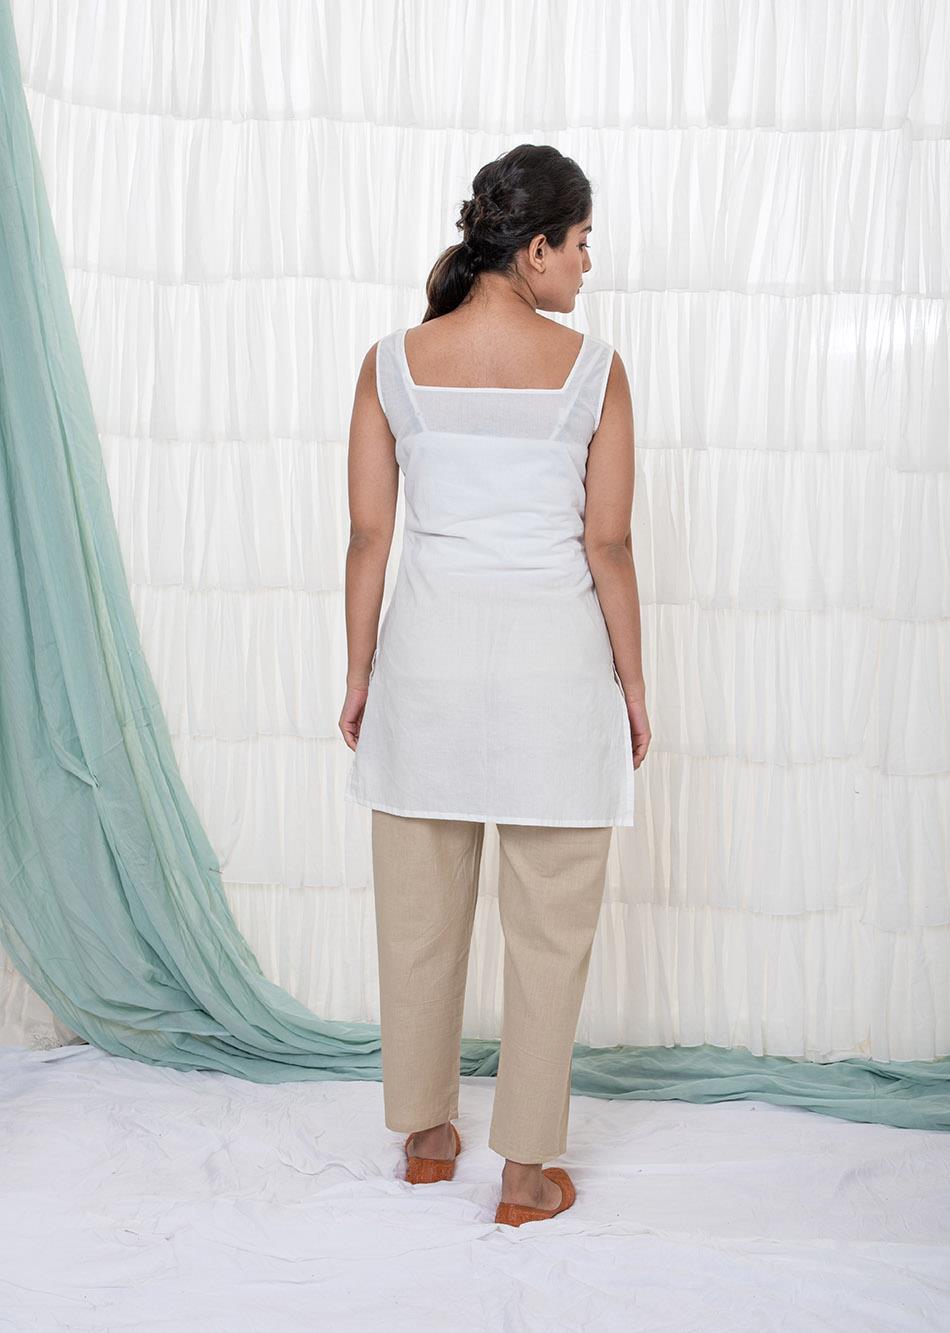 COTTON SLIP (SQUARE NECK) By Jovi Fashion